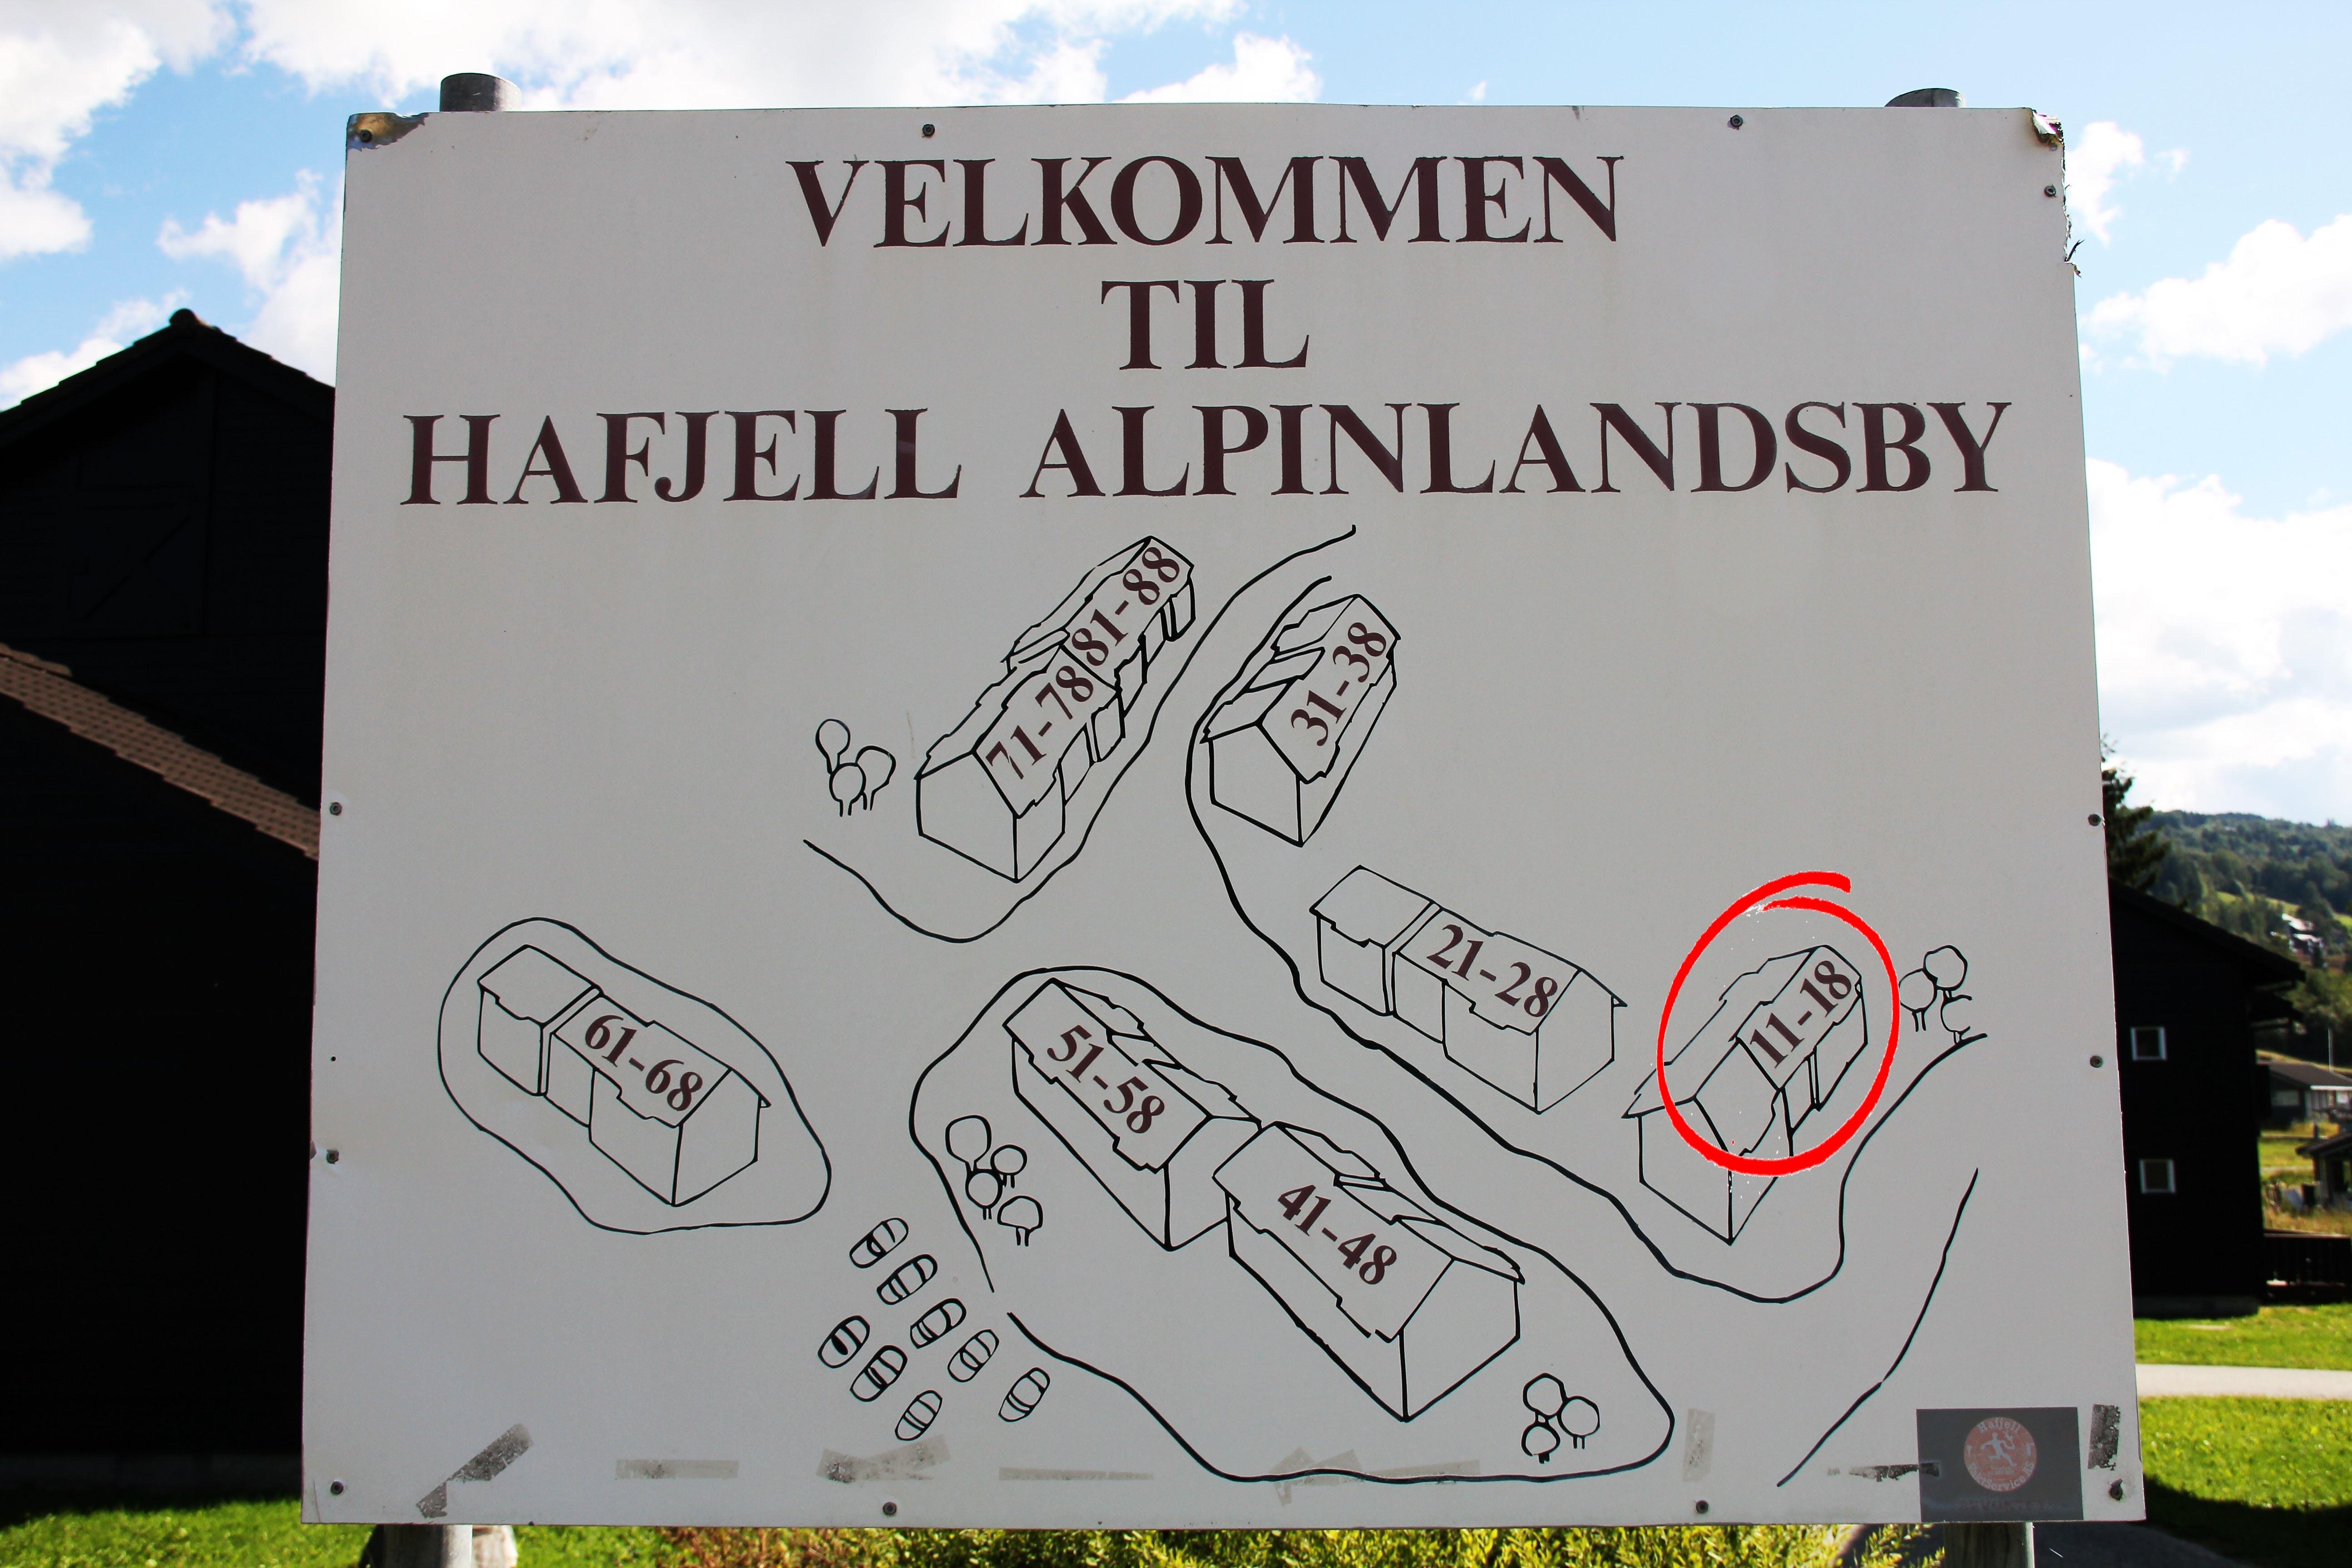 Hafjell Alpinlandsby Pluss